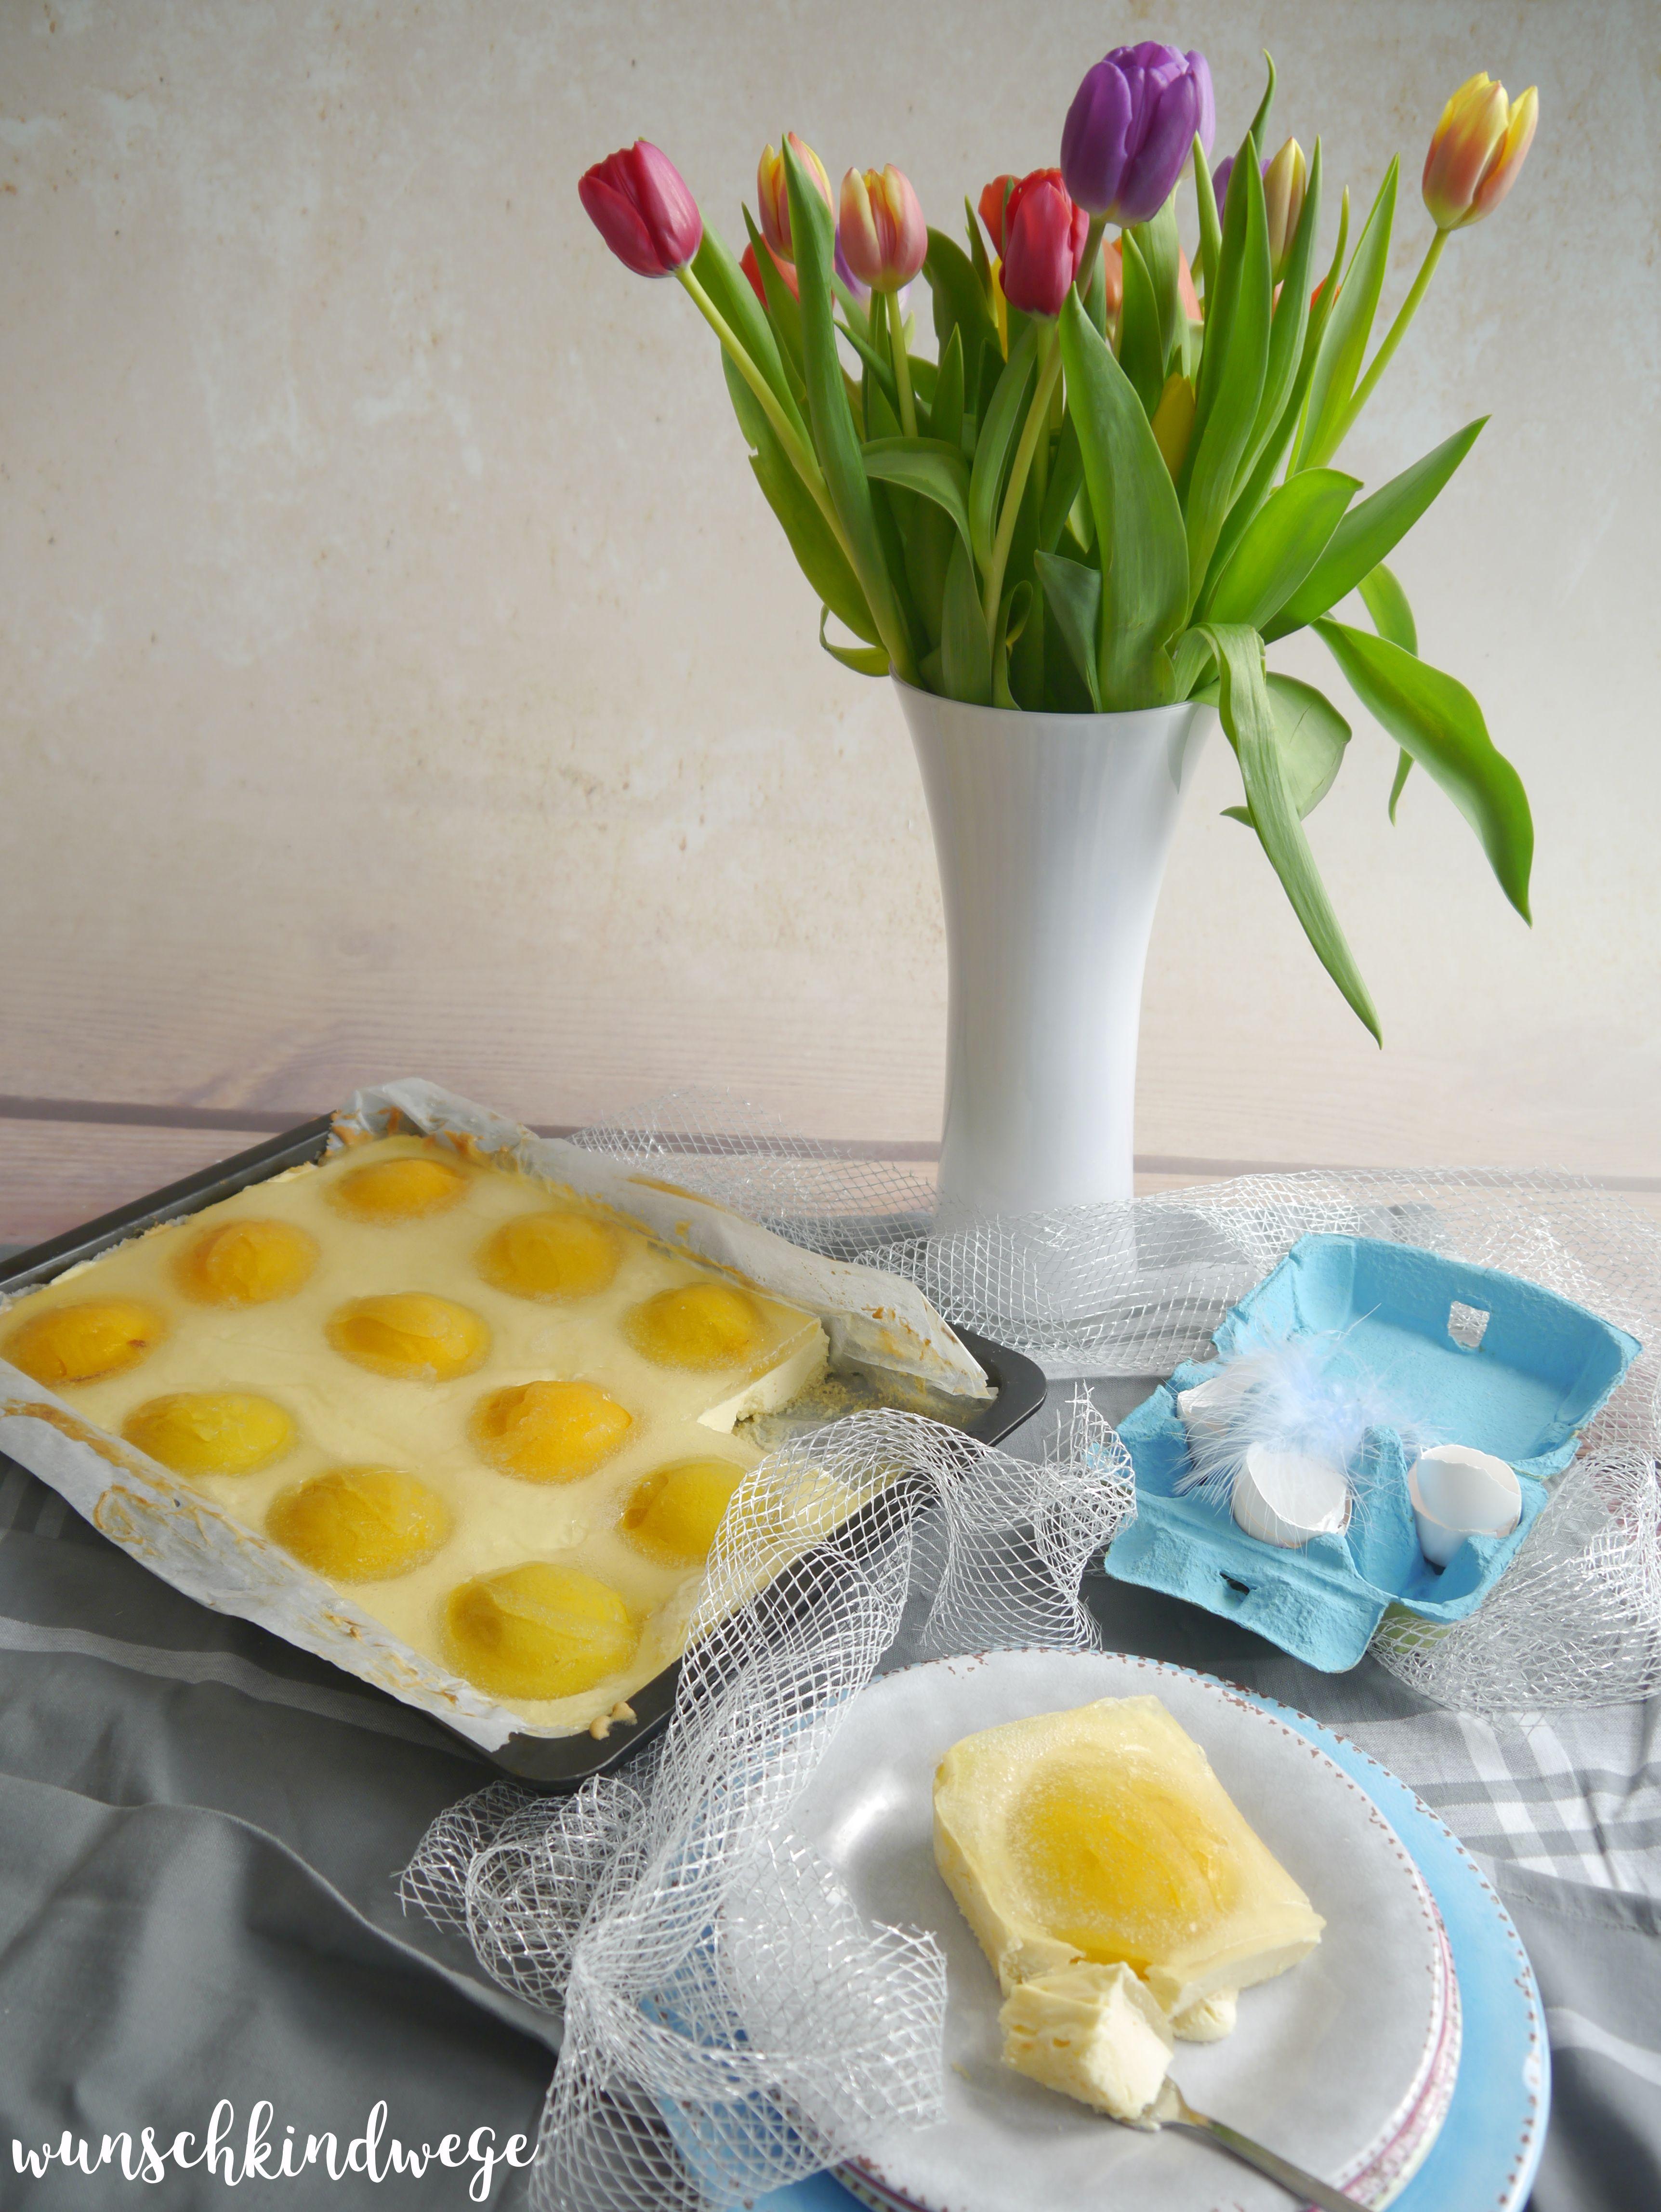 Spiegel-Ei Kuchen Anschnitt